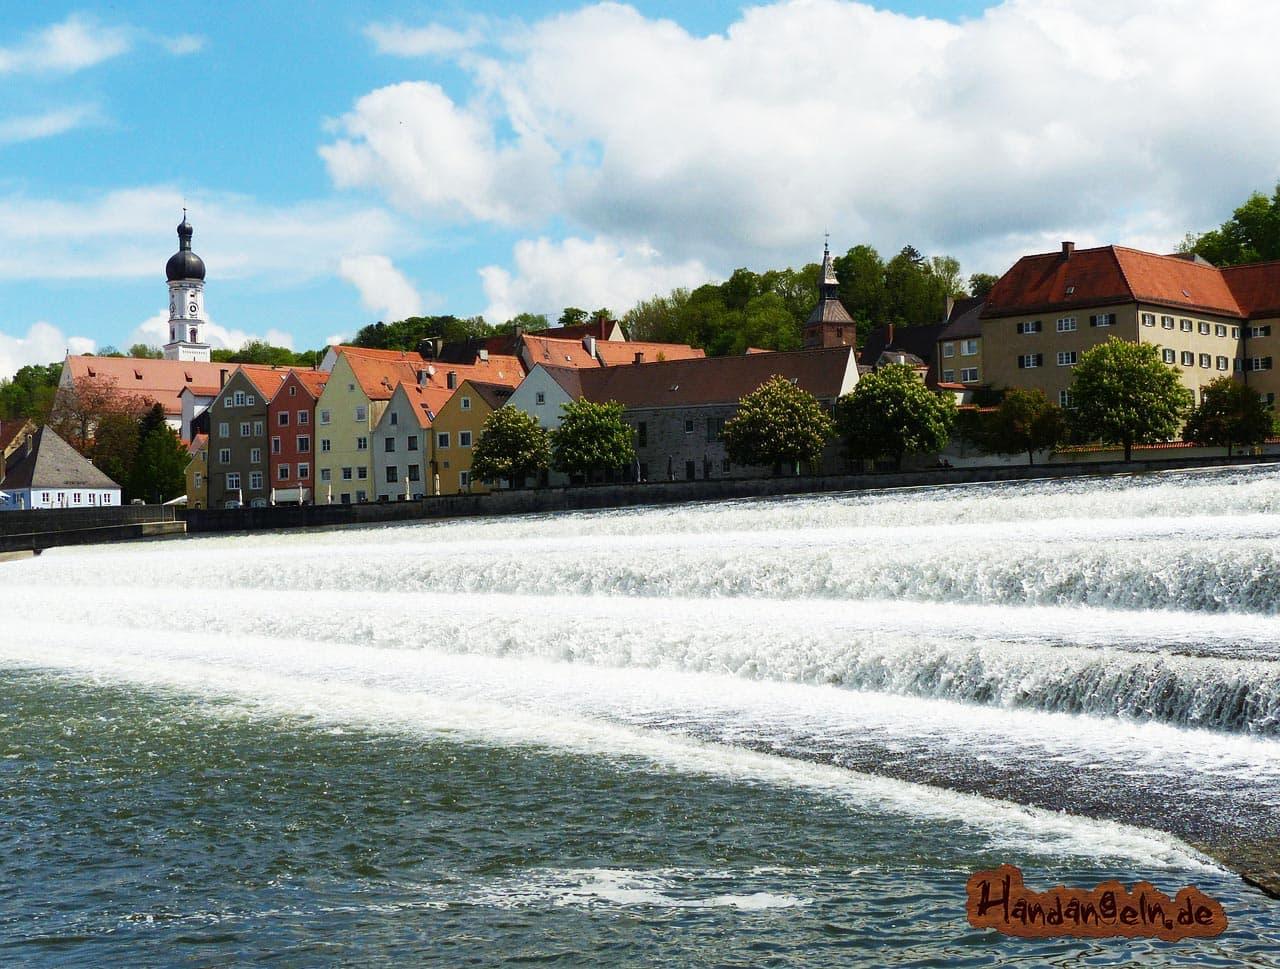 Rapfen angeln Sommer Landsberg am Lech